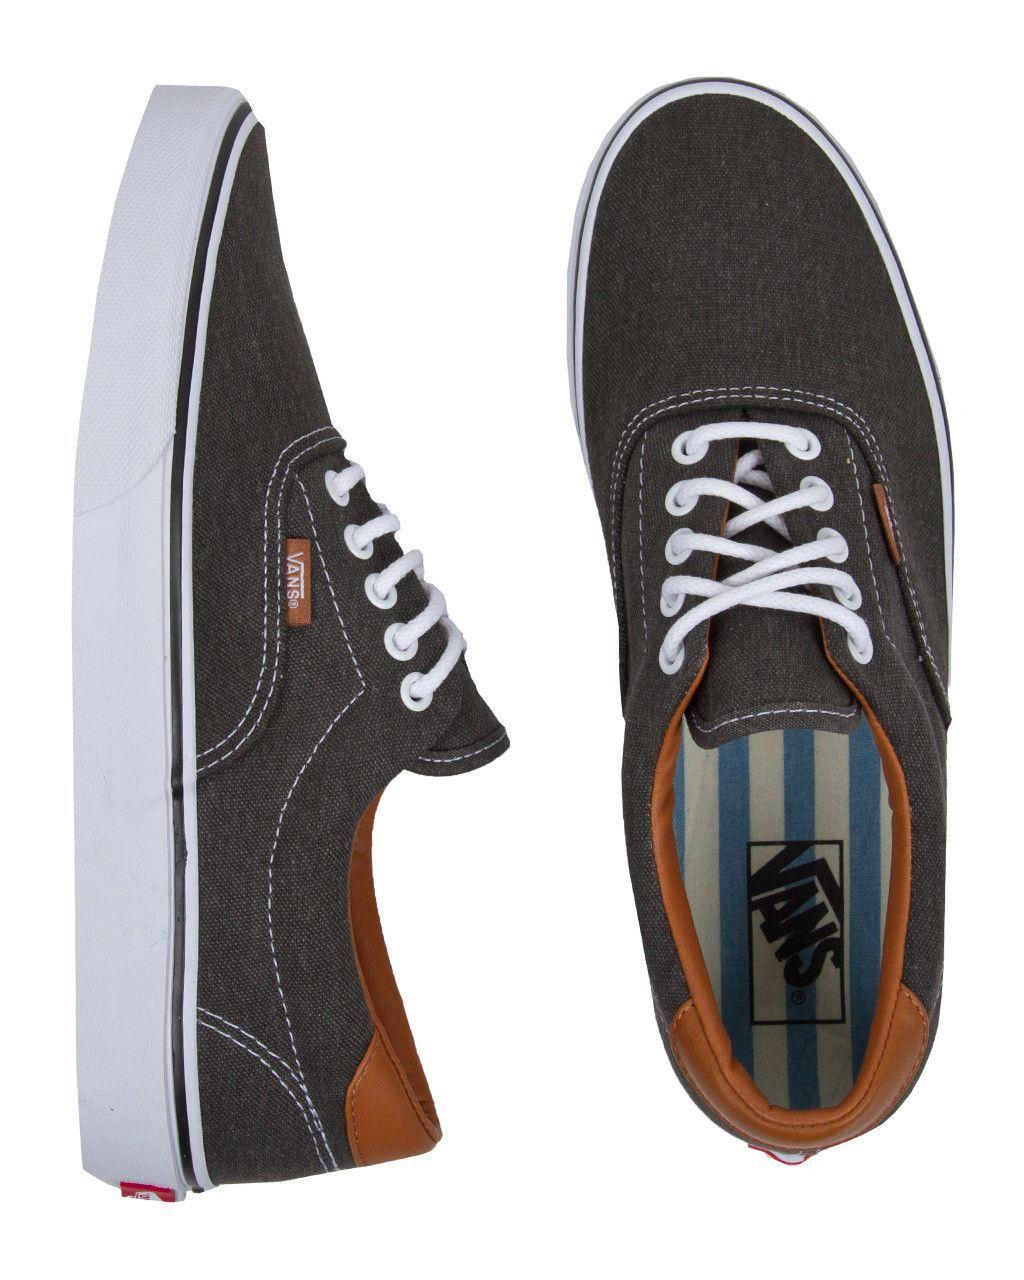 35151941f9f35e Vans Era 59 - Washed C   L in Black